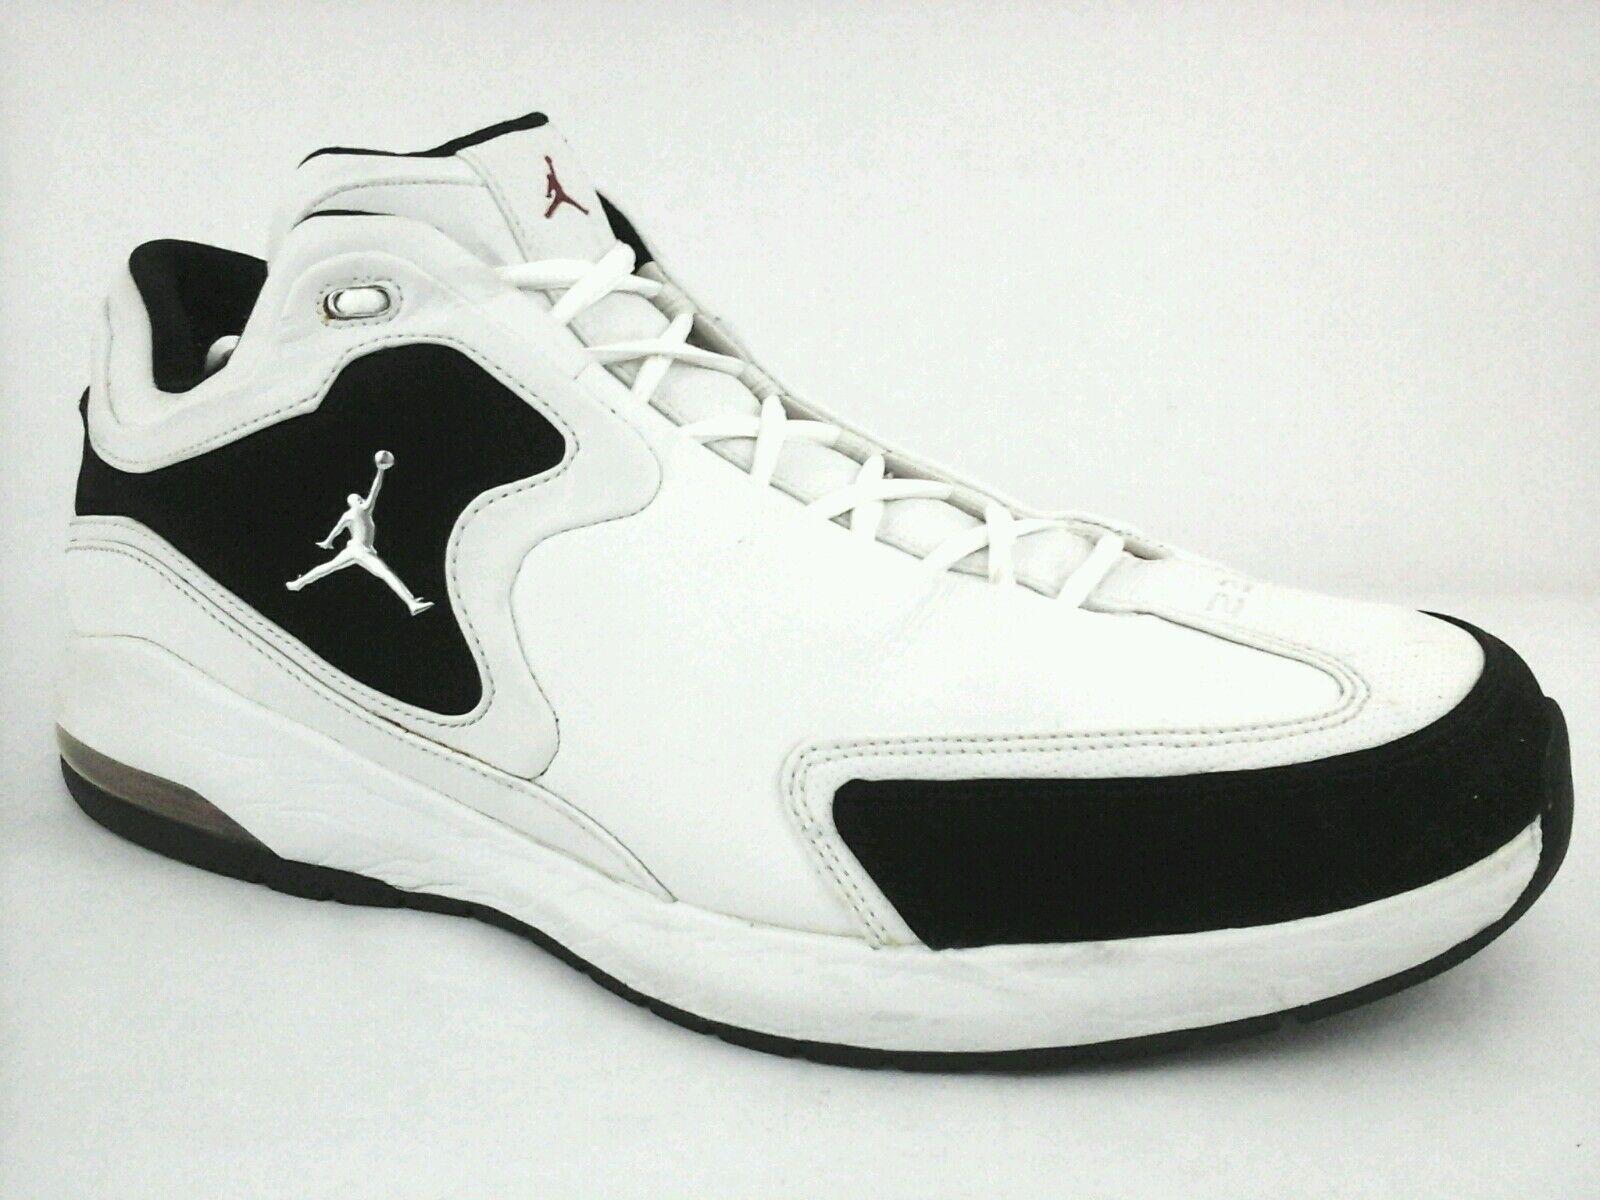 Michael Jordan 23 High Top Shoes Sneakers Basketball White Bk 2018 US 13